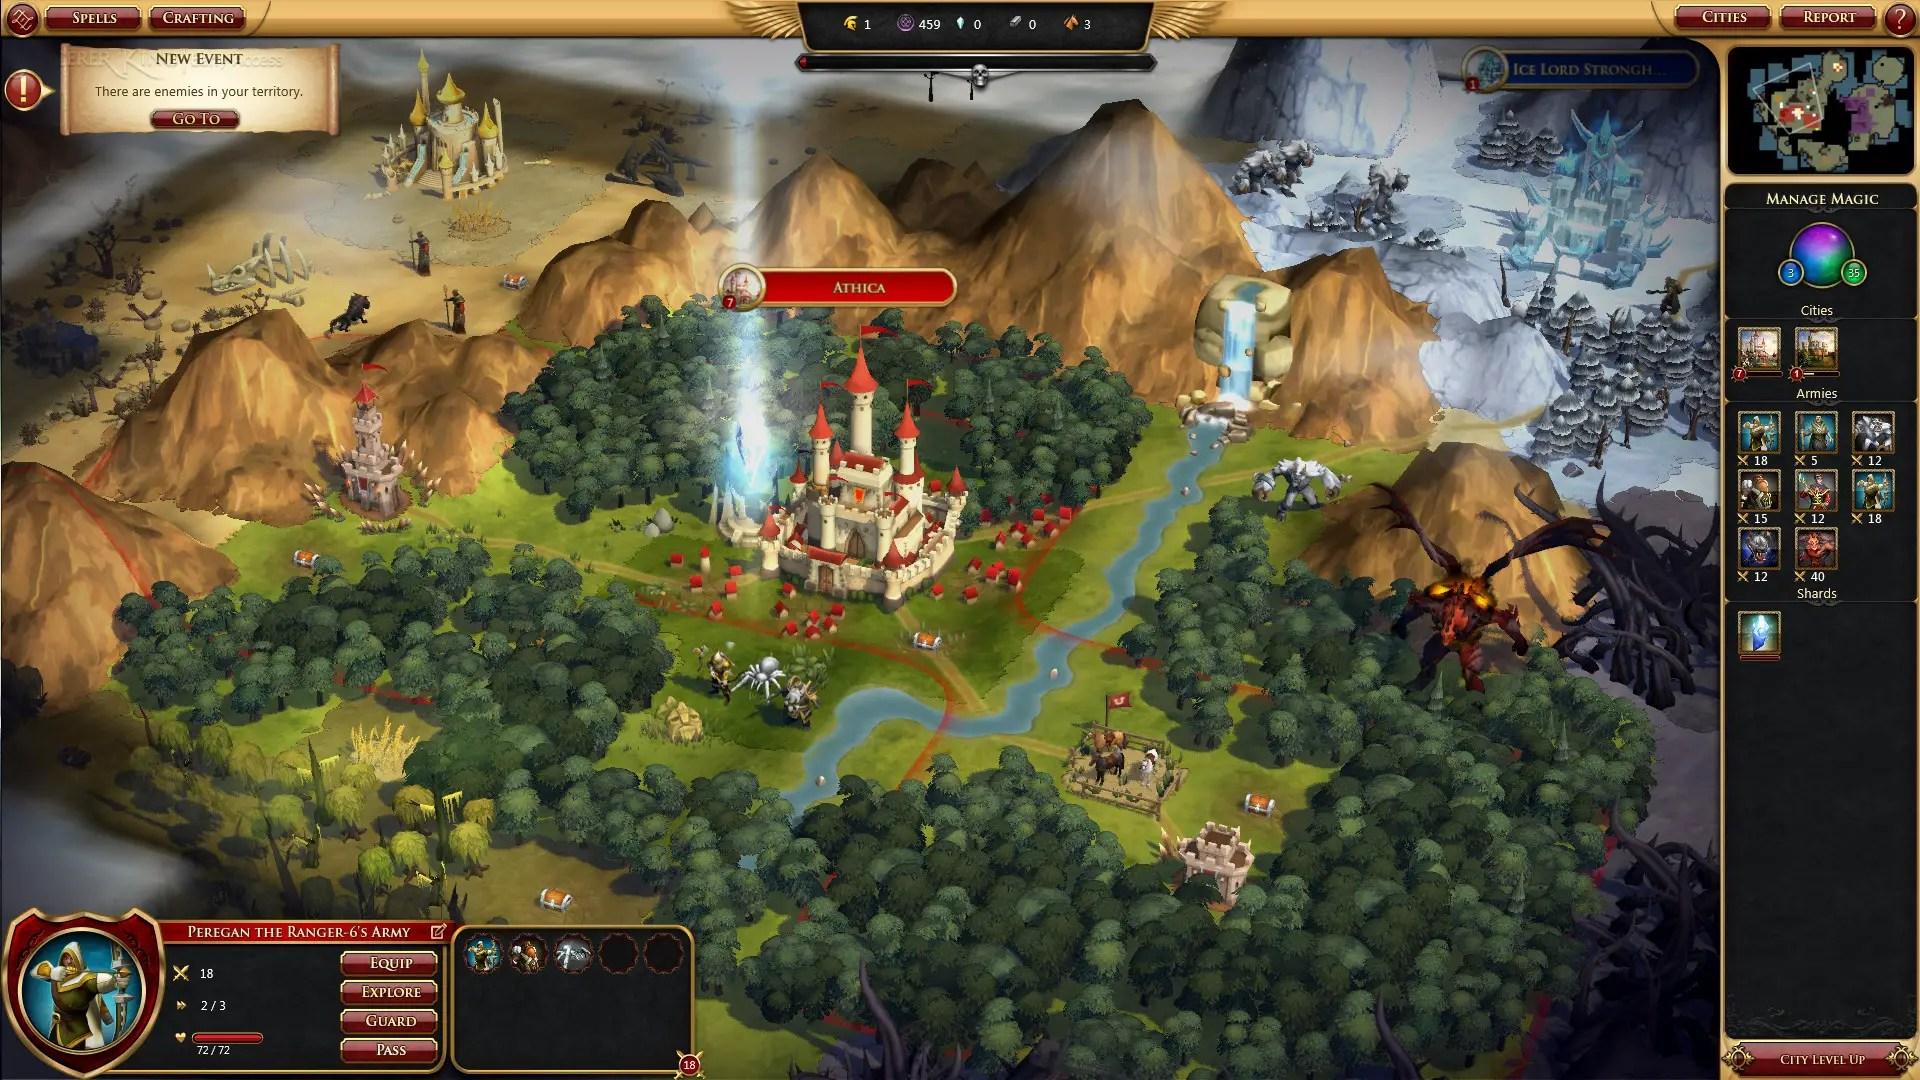 Fantasy 4X Strategy Game Sorcerer King Enters Full Release